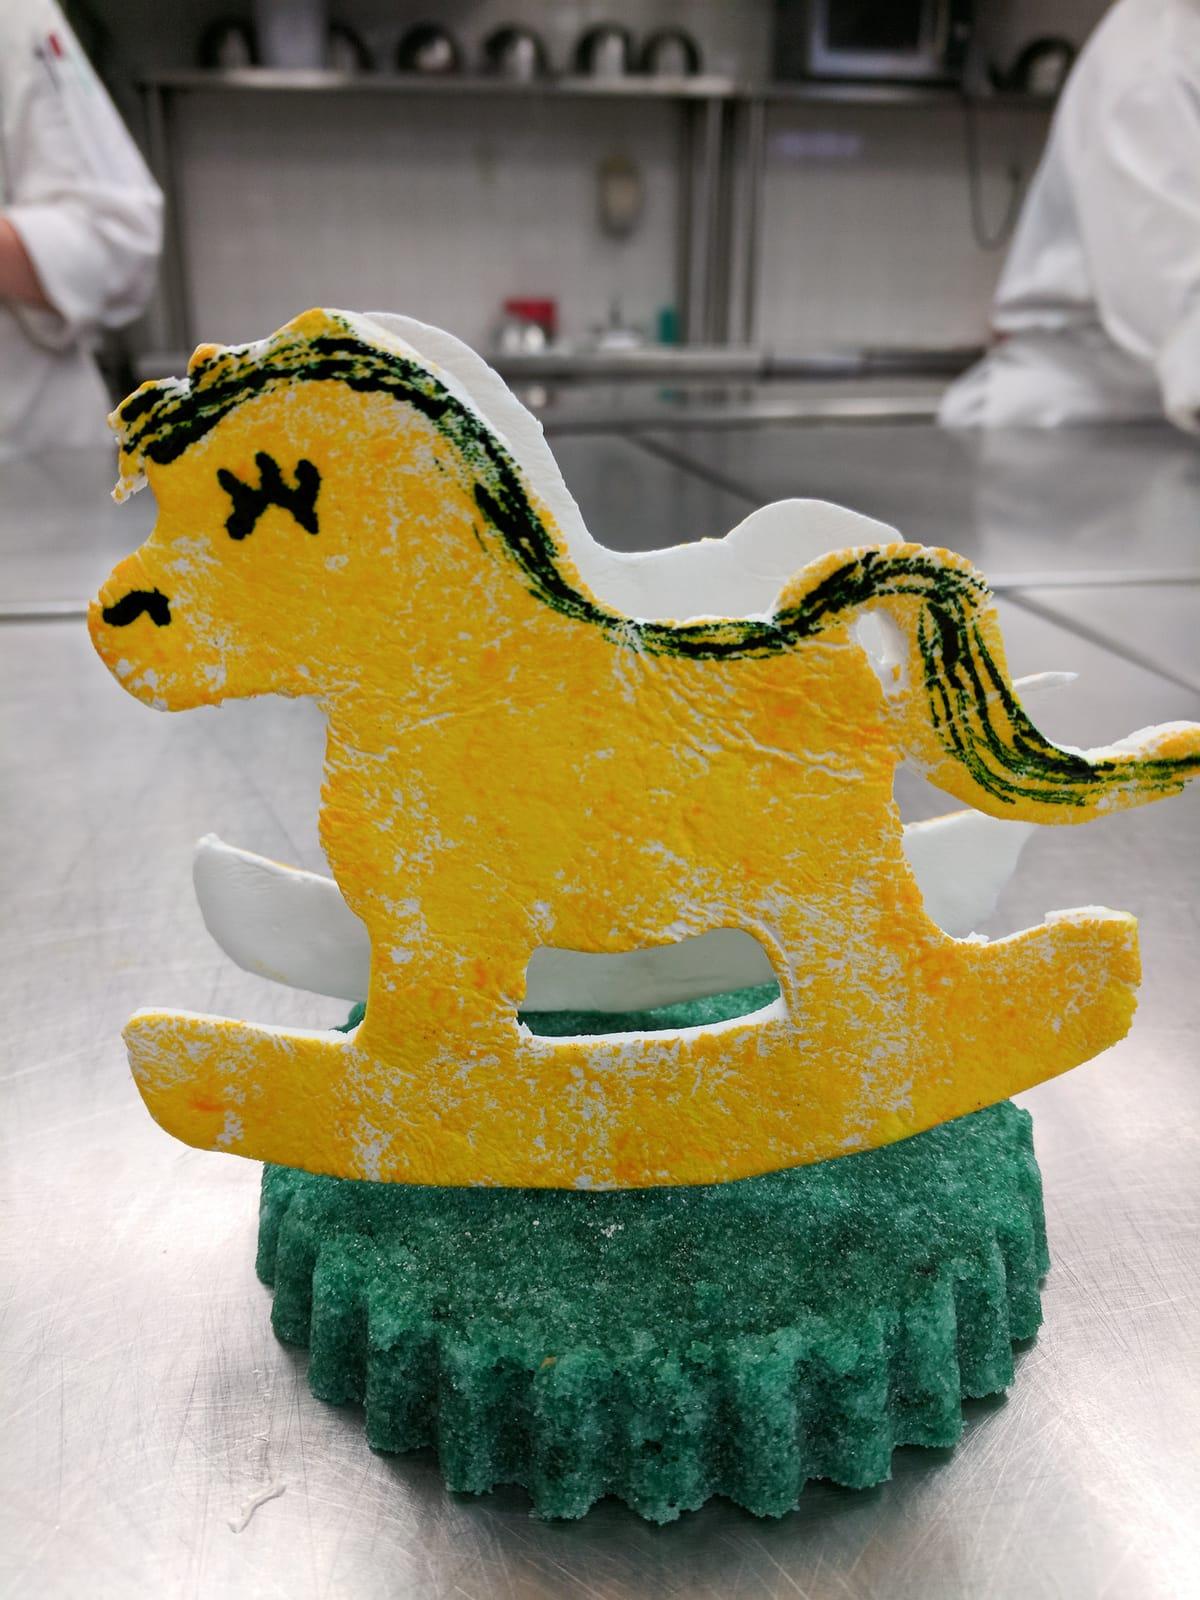 Pastillage rocking horse